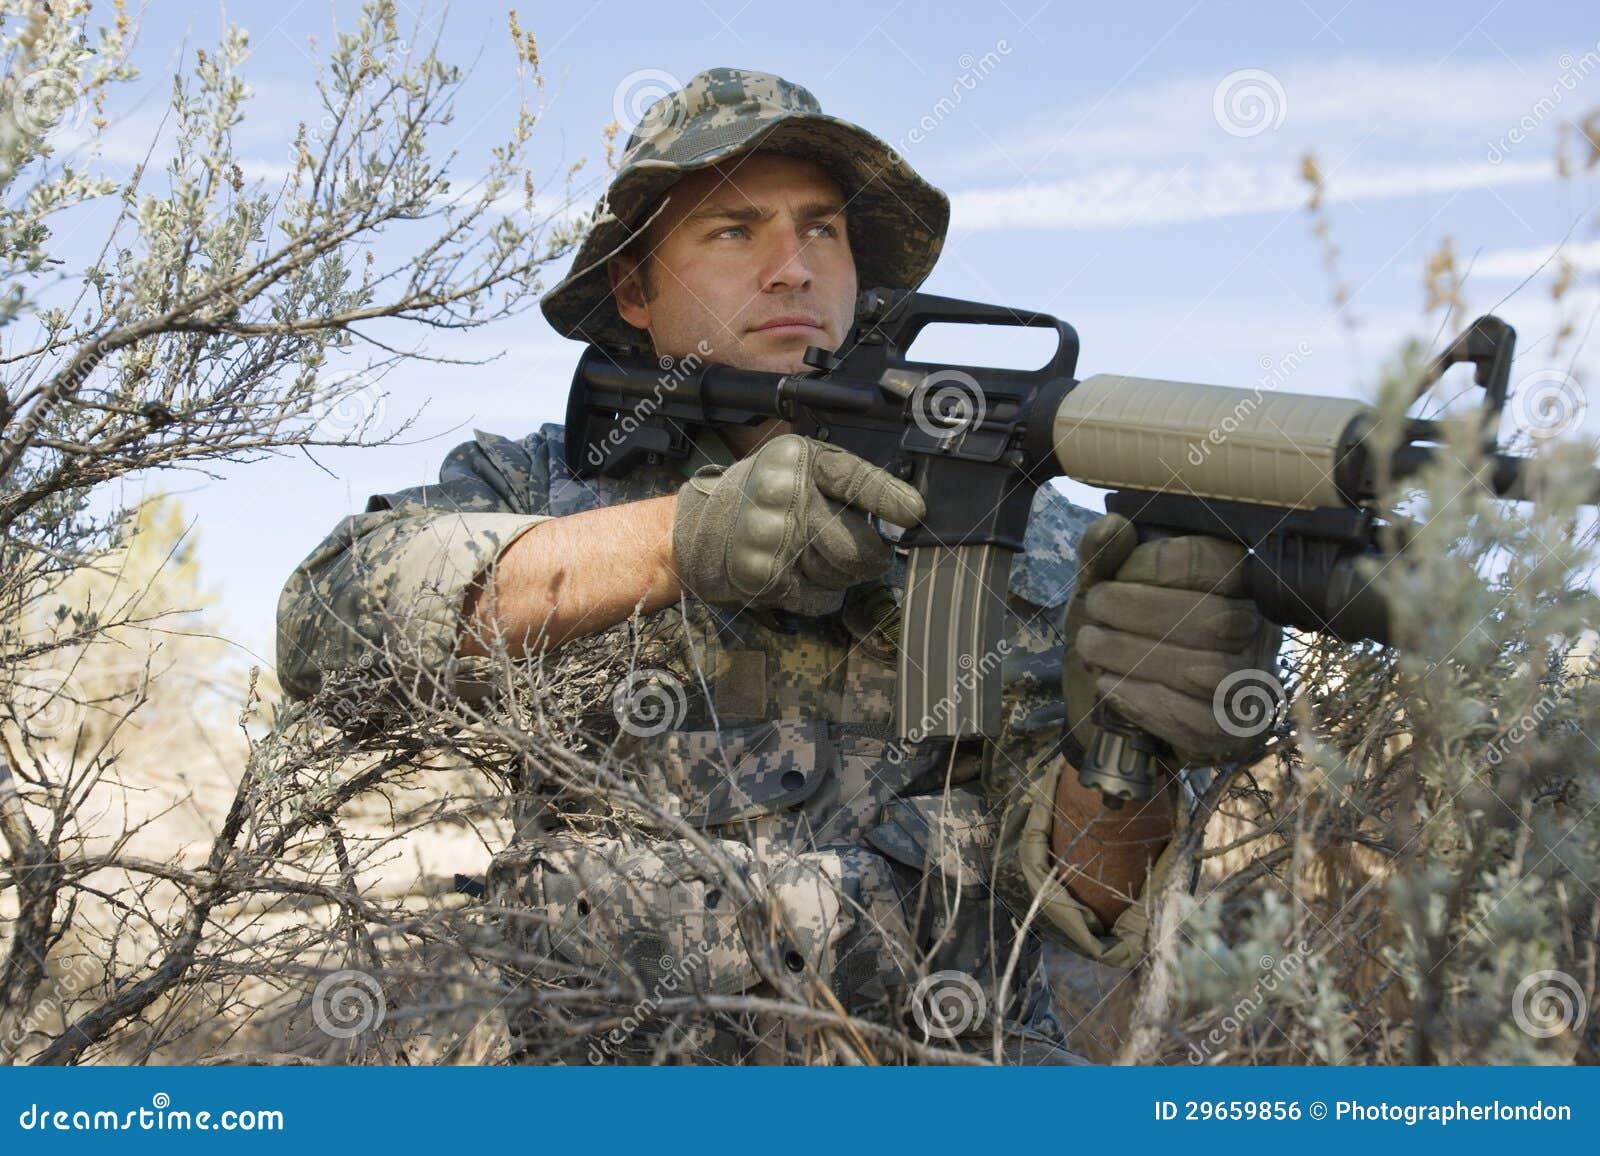 Soldier Aiming Machine Gun Stock Photo Image Of